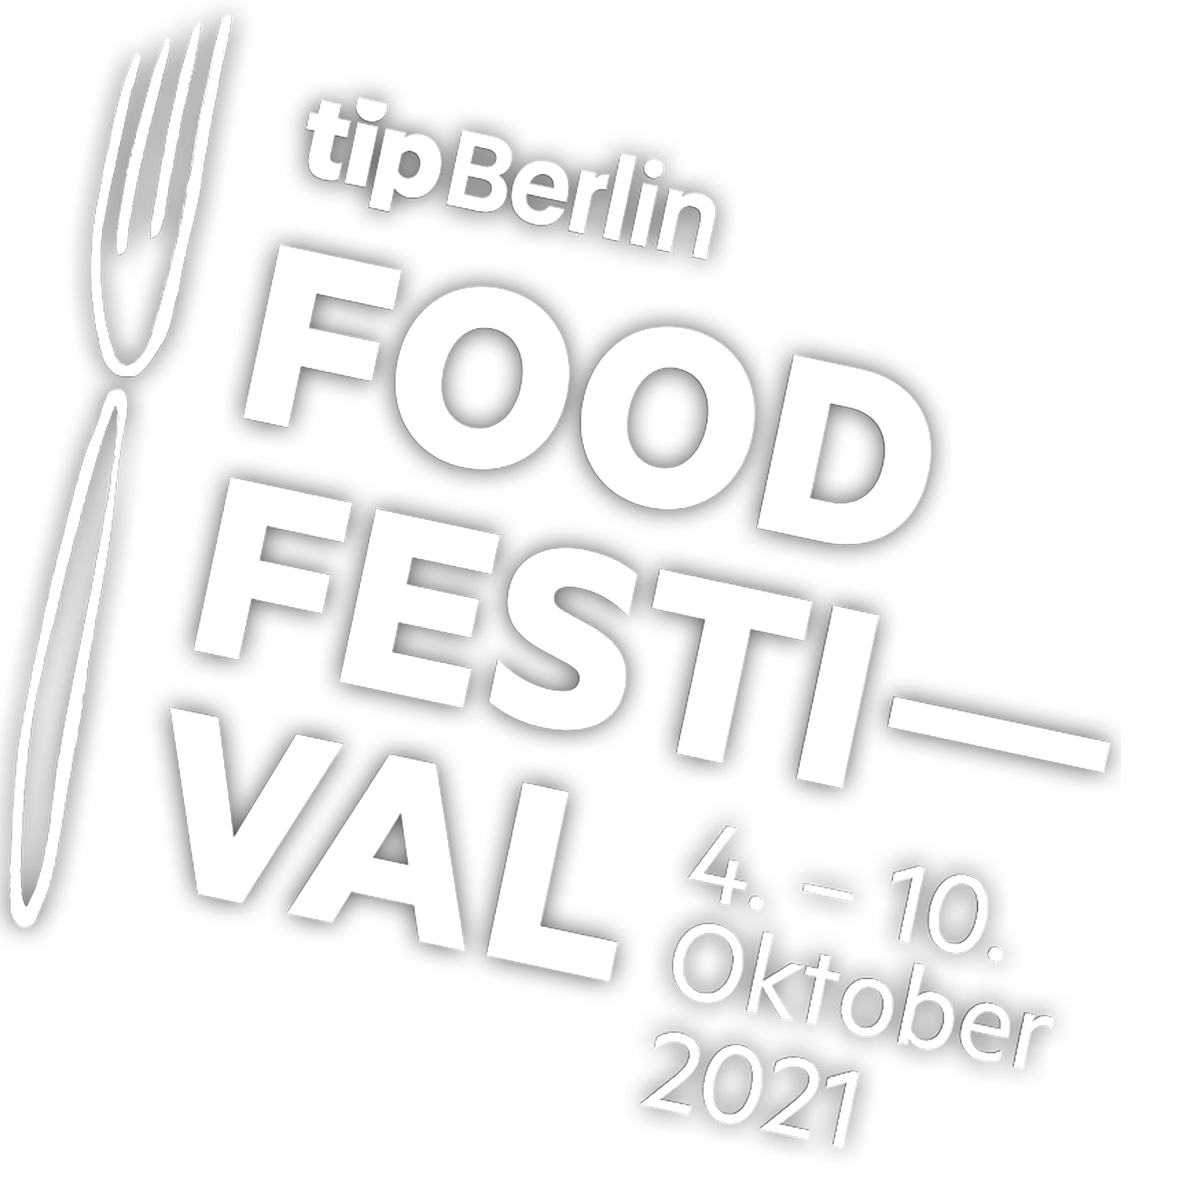 Tip Berlin – Food Festival